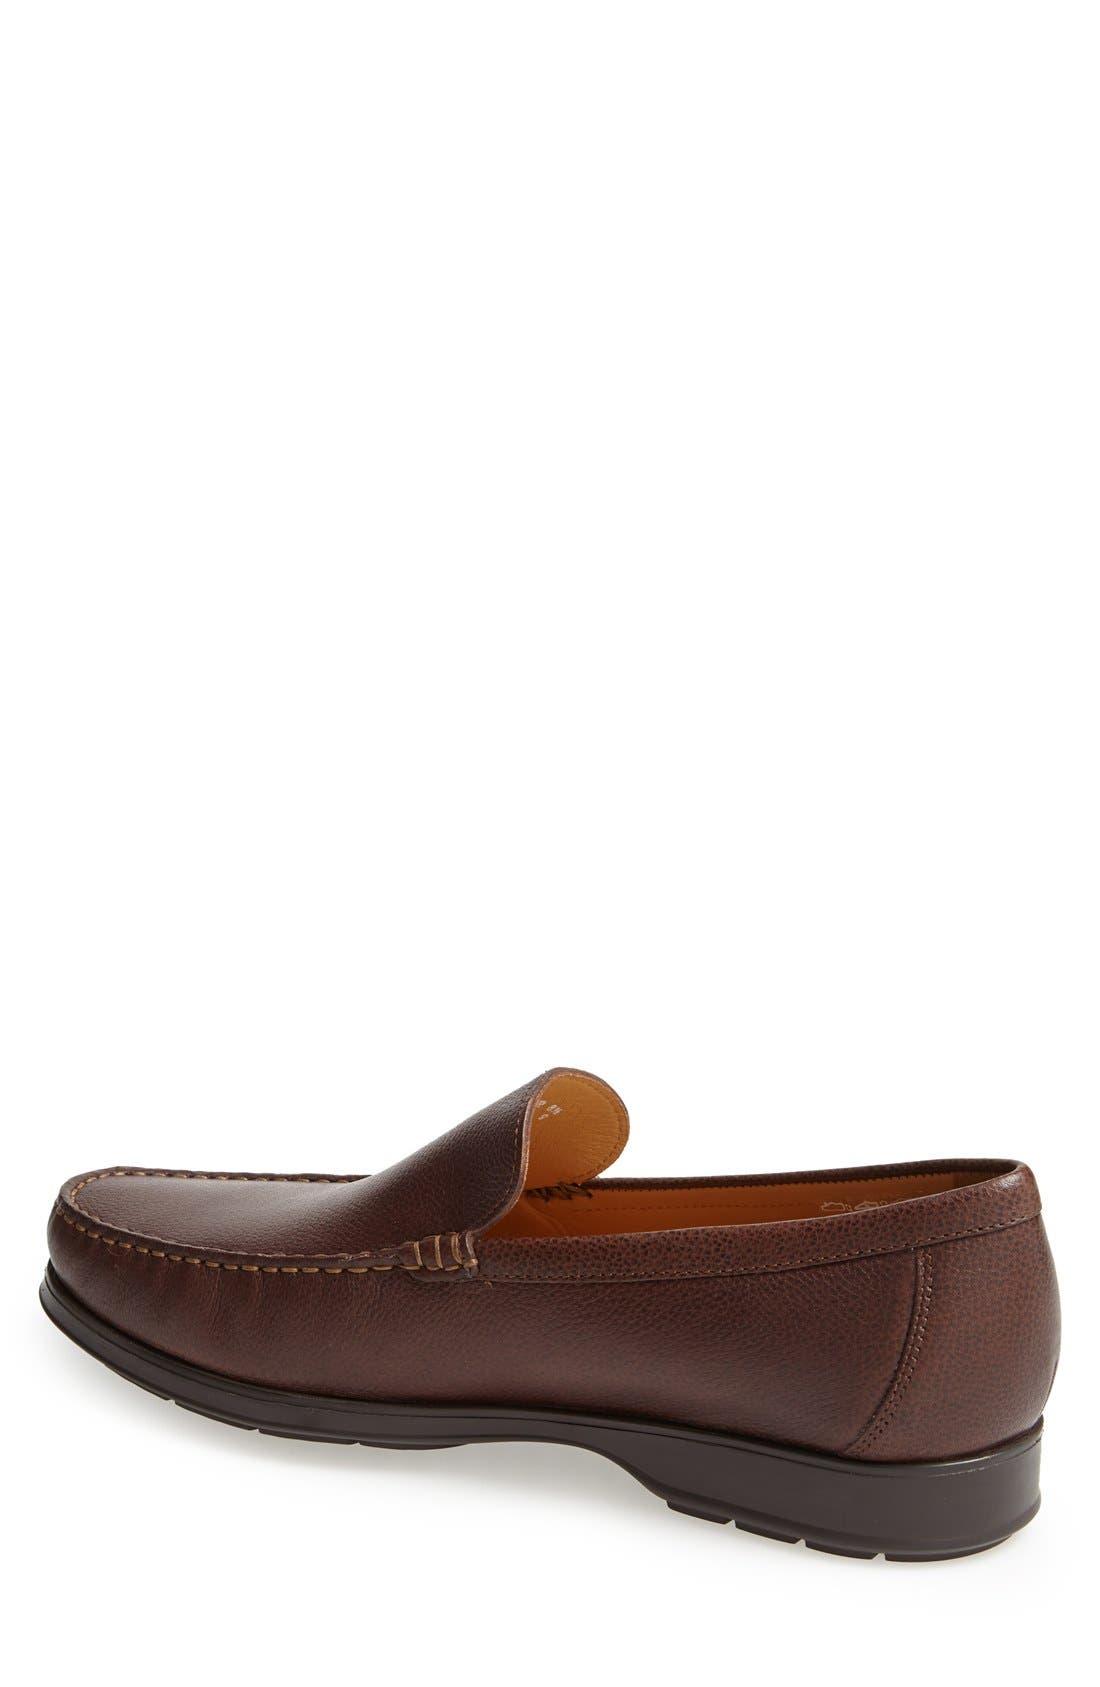 'Henri' Loafer,                             Alternate thumbnail 2, color,                             Chestnut Leather